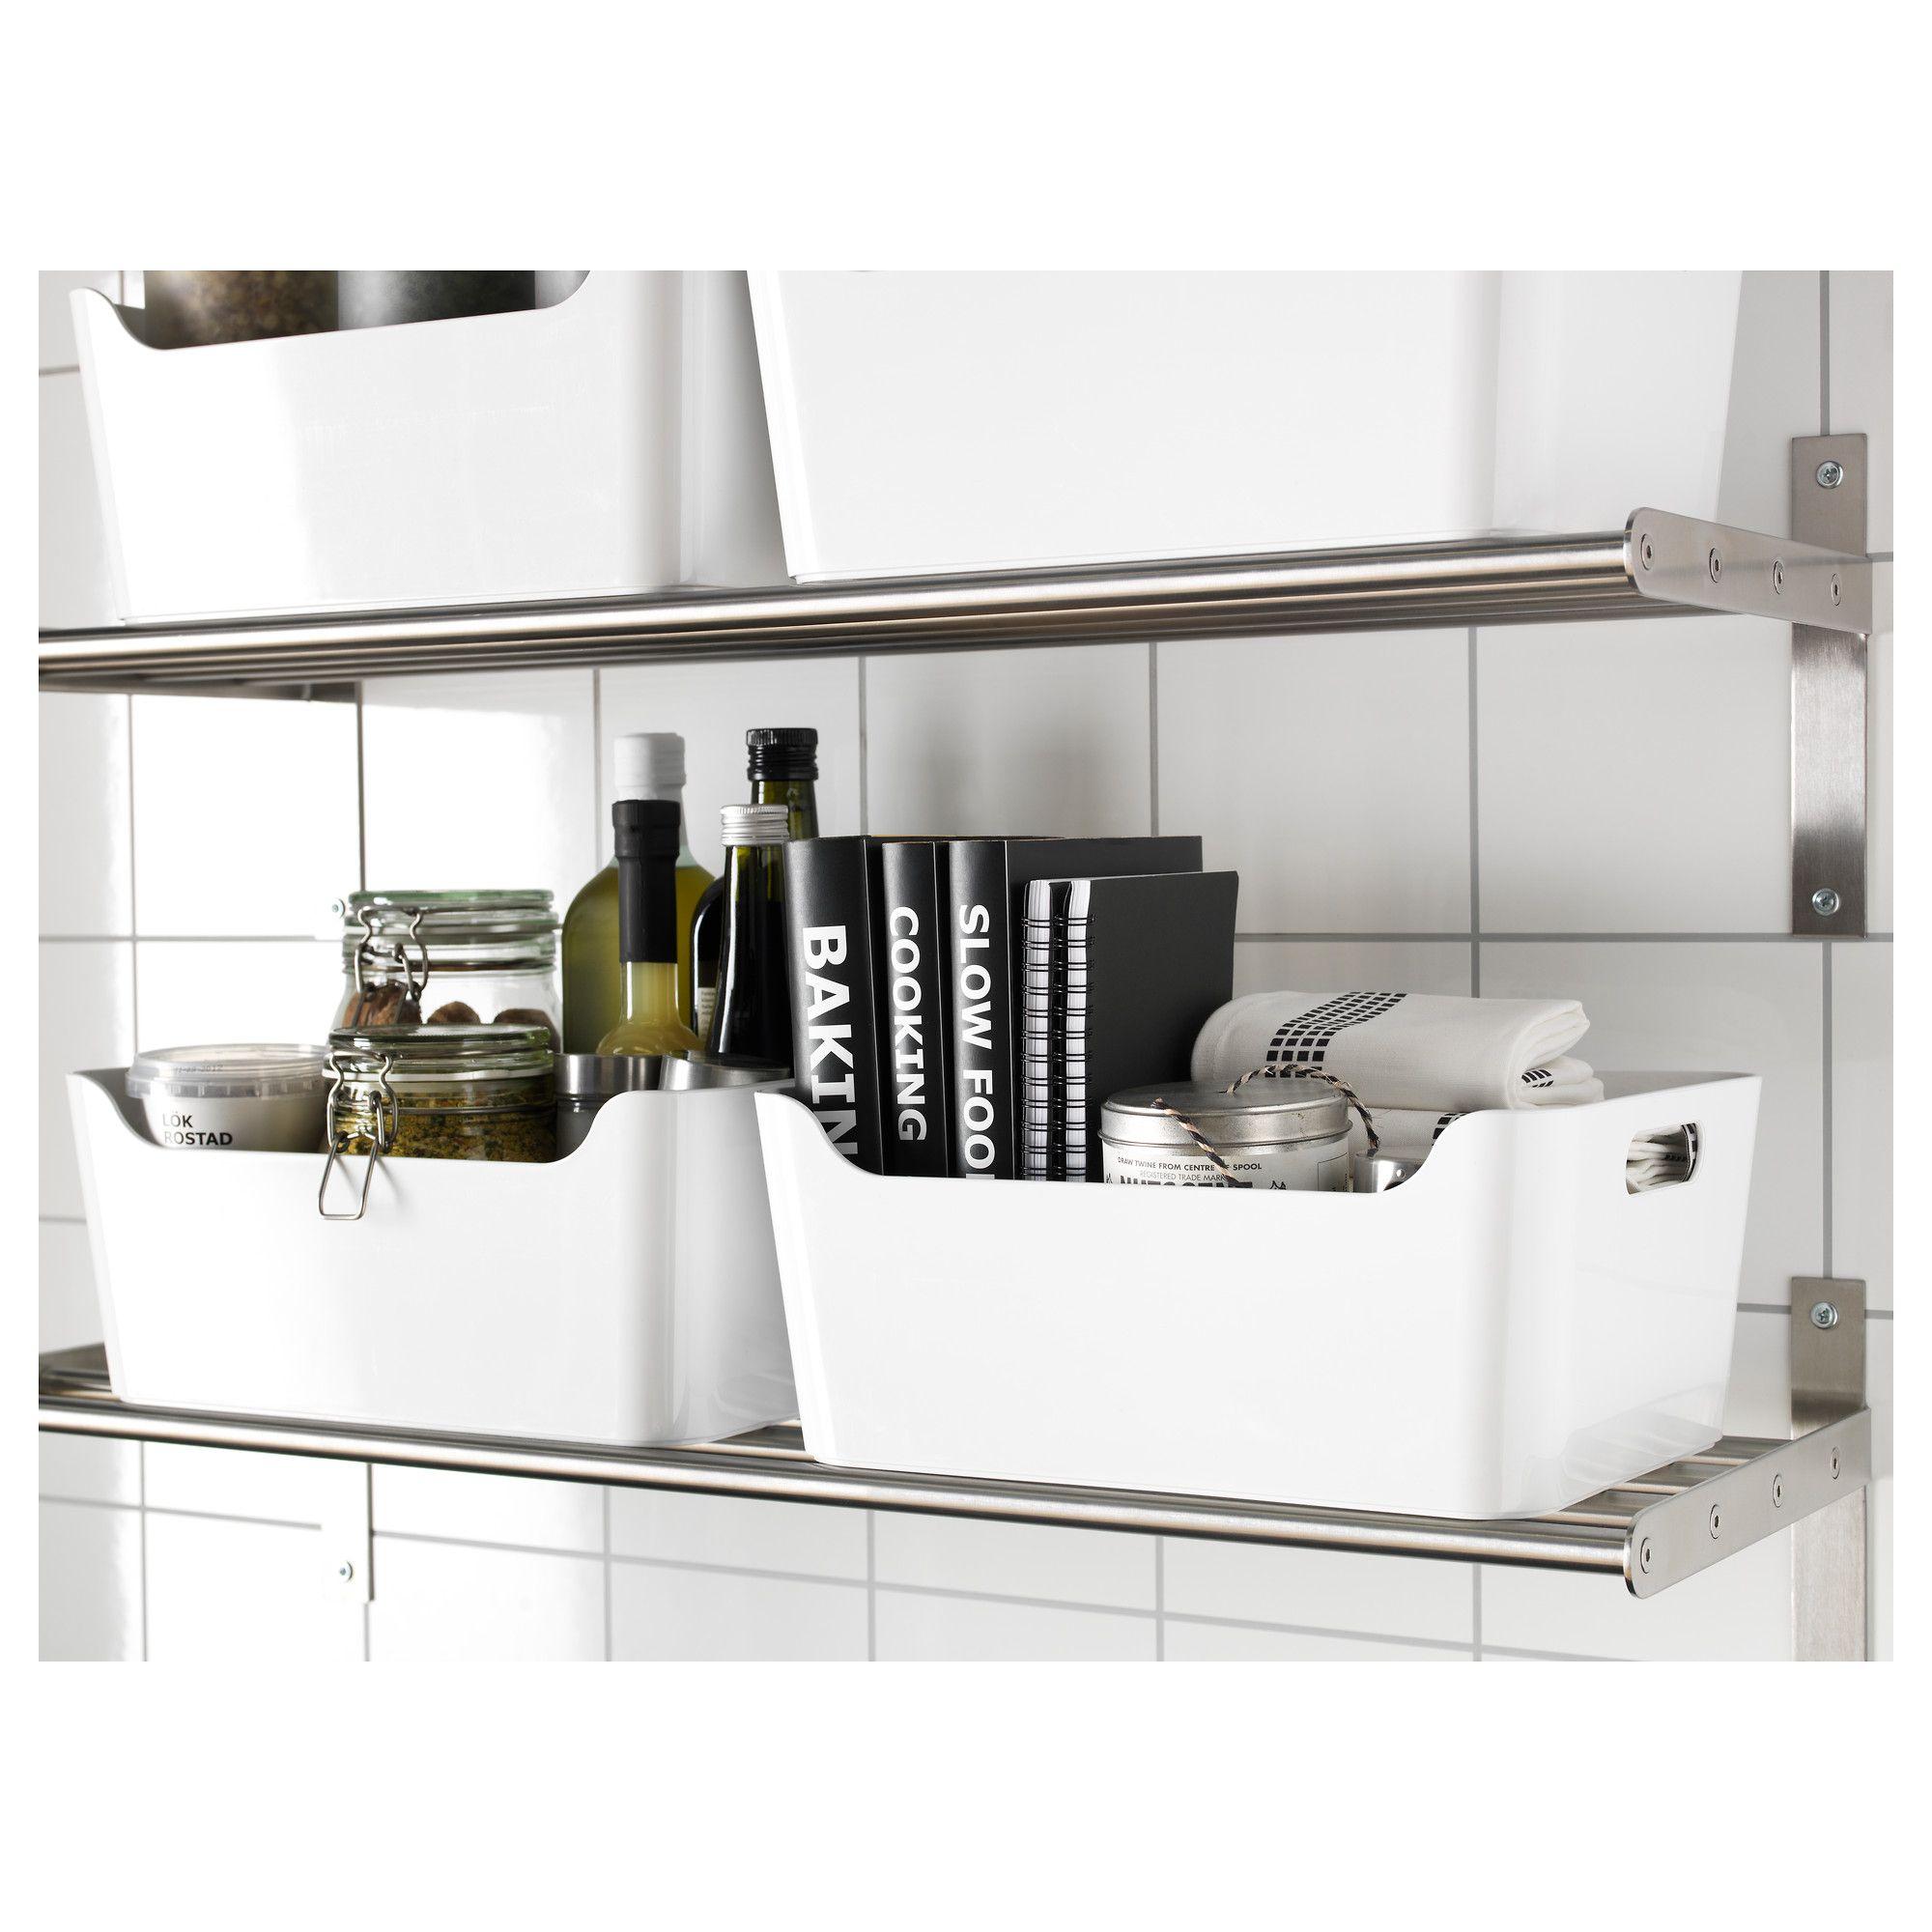 Ikea Kuche Einbauschrank